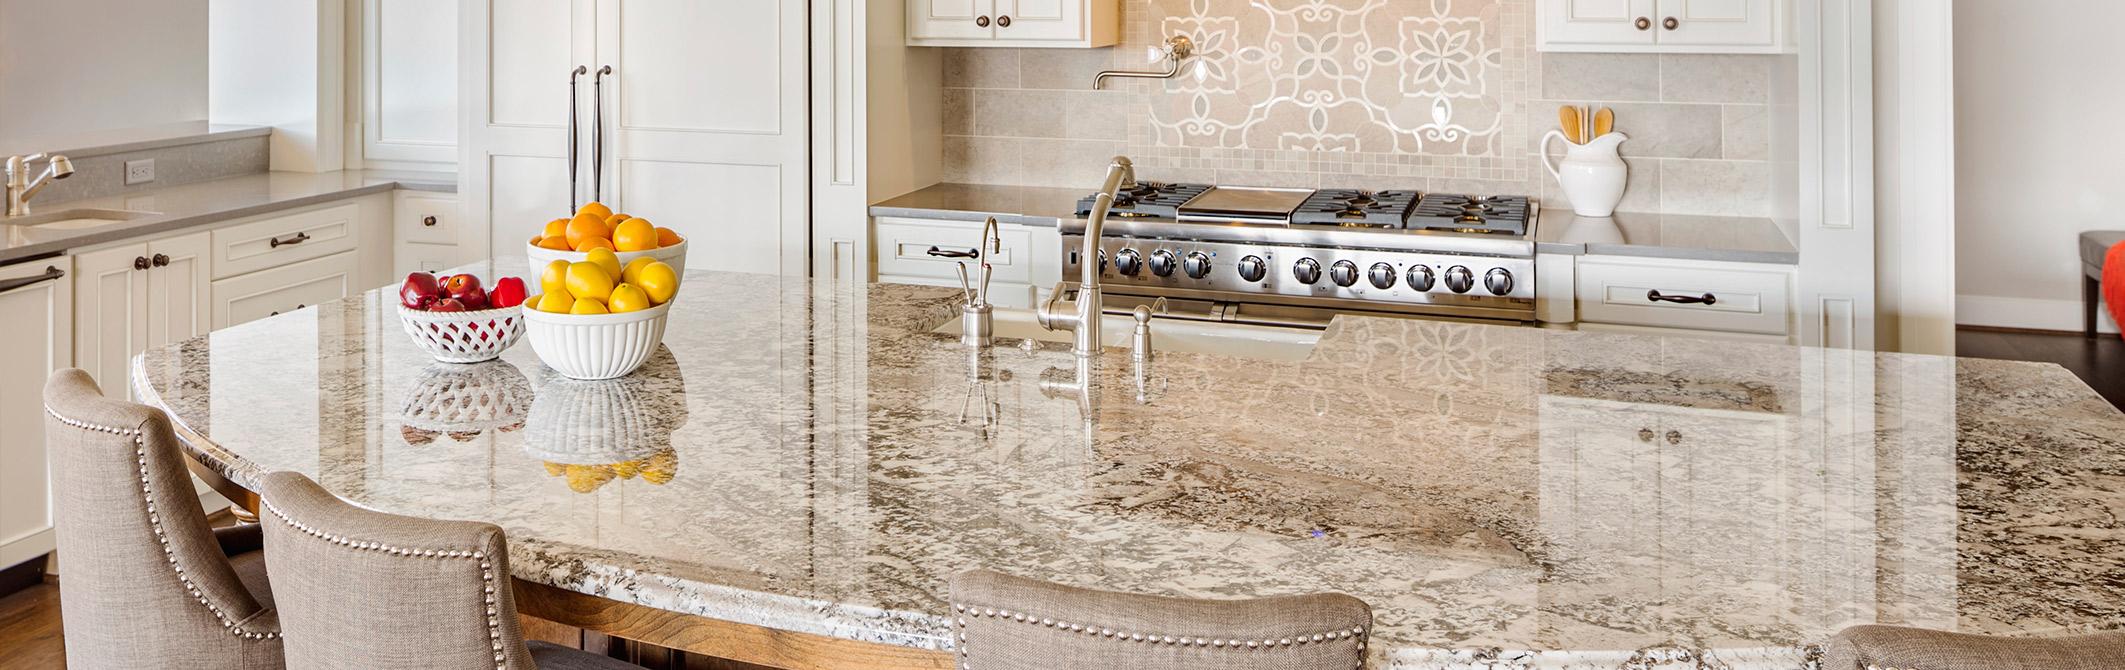 granite counter installers delray beach